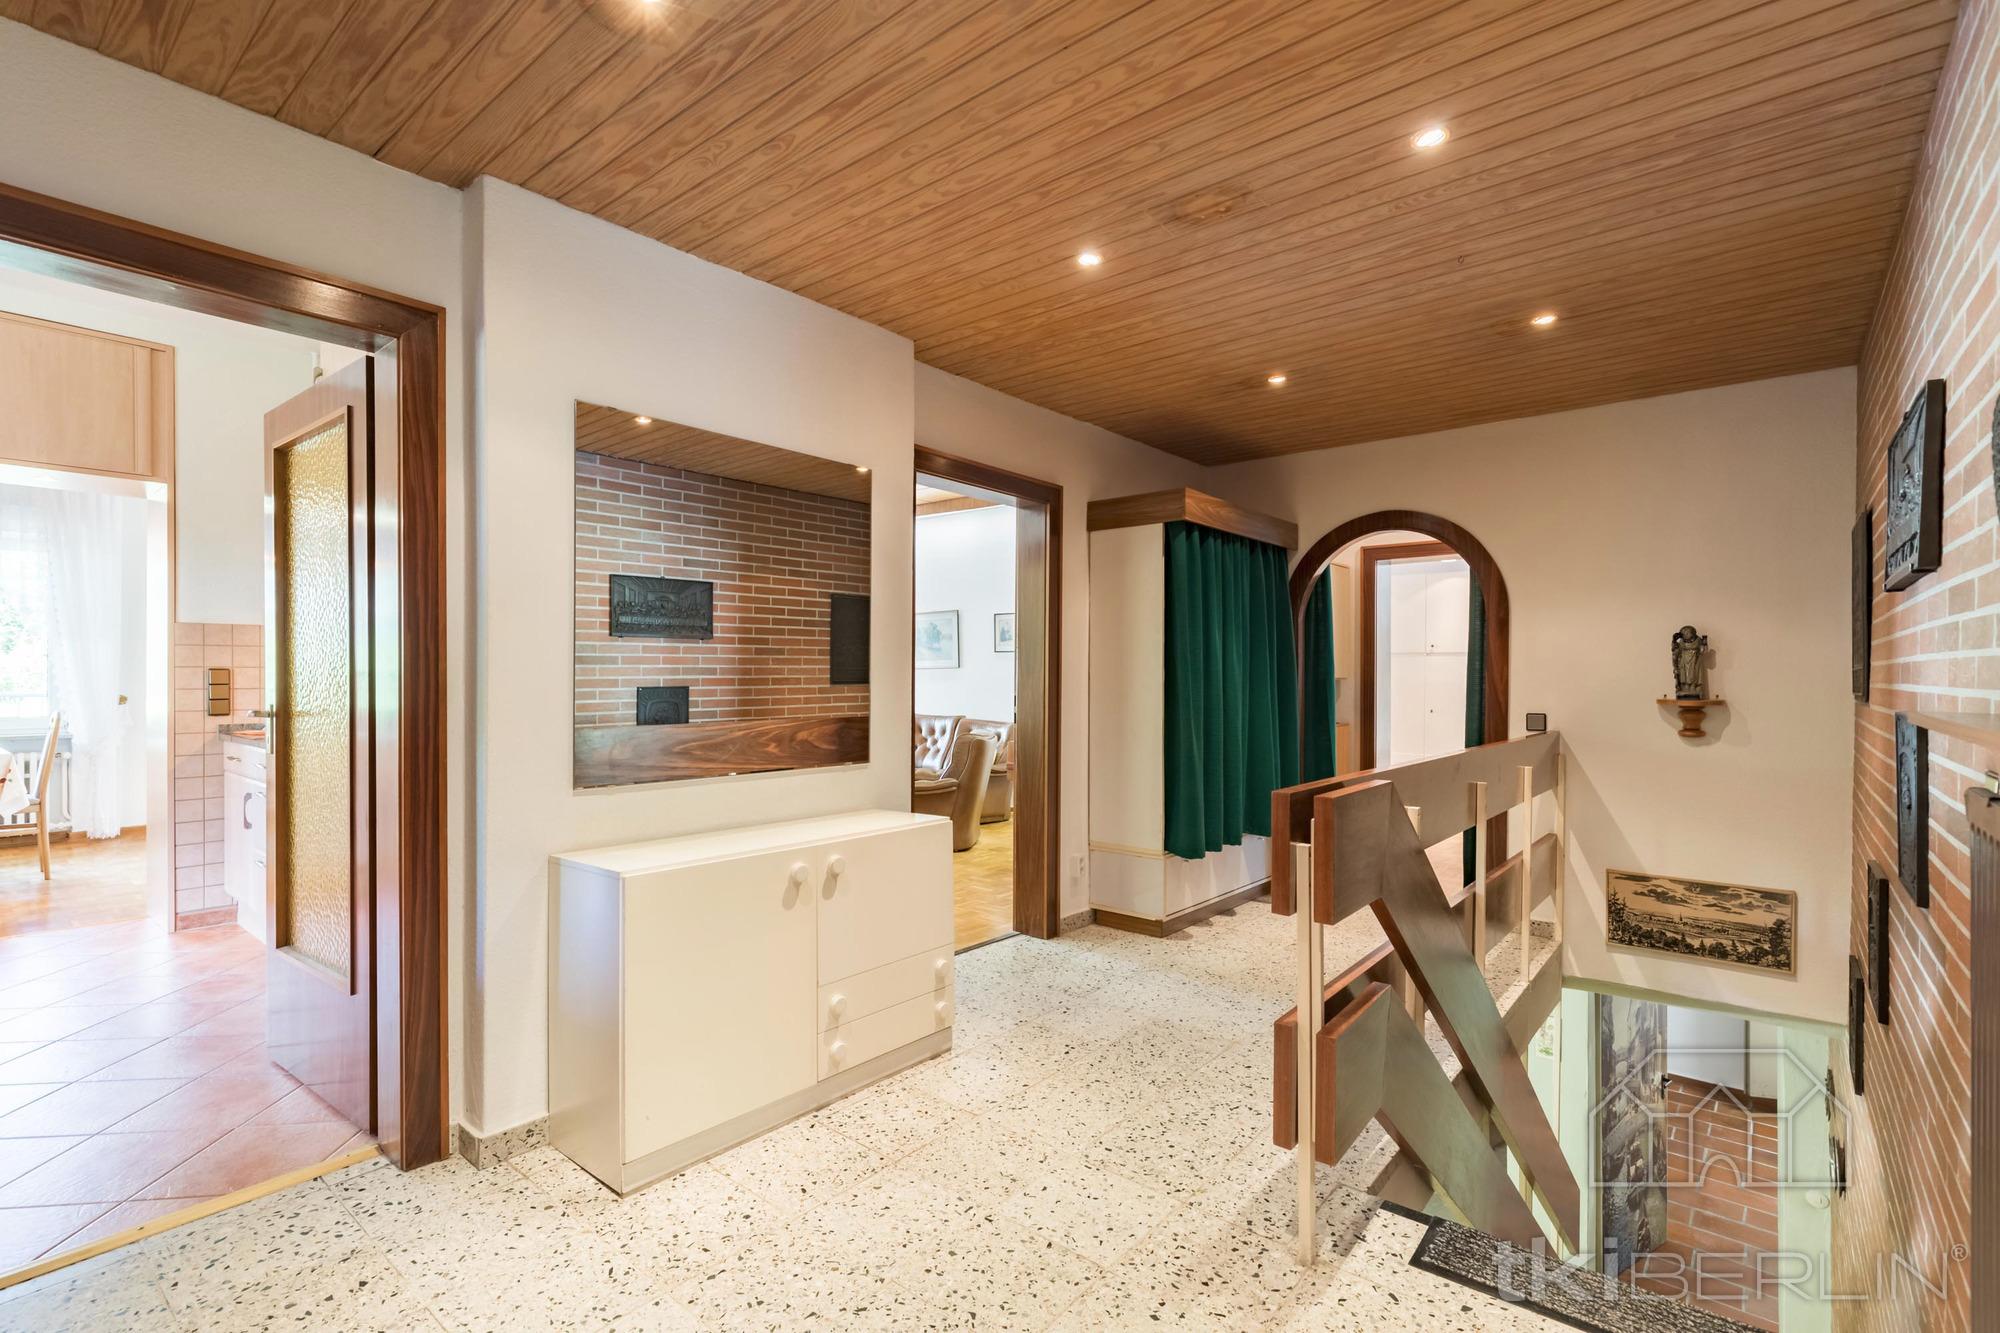 mehrfamilienhaus in berlin 383 m. Black Bedroom Furniture Sets. Home Design Ideas